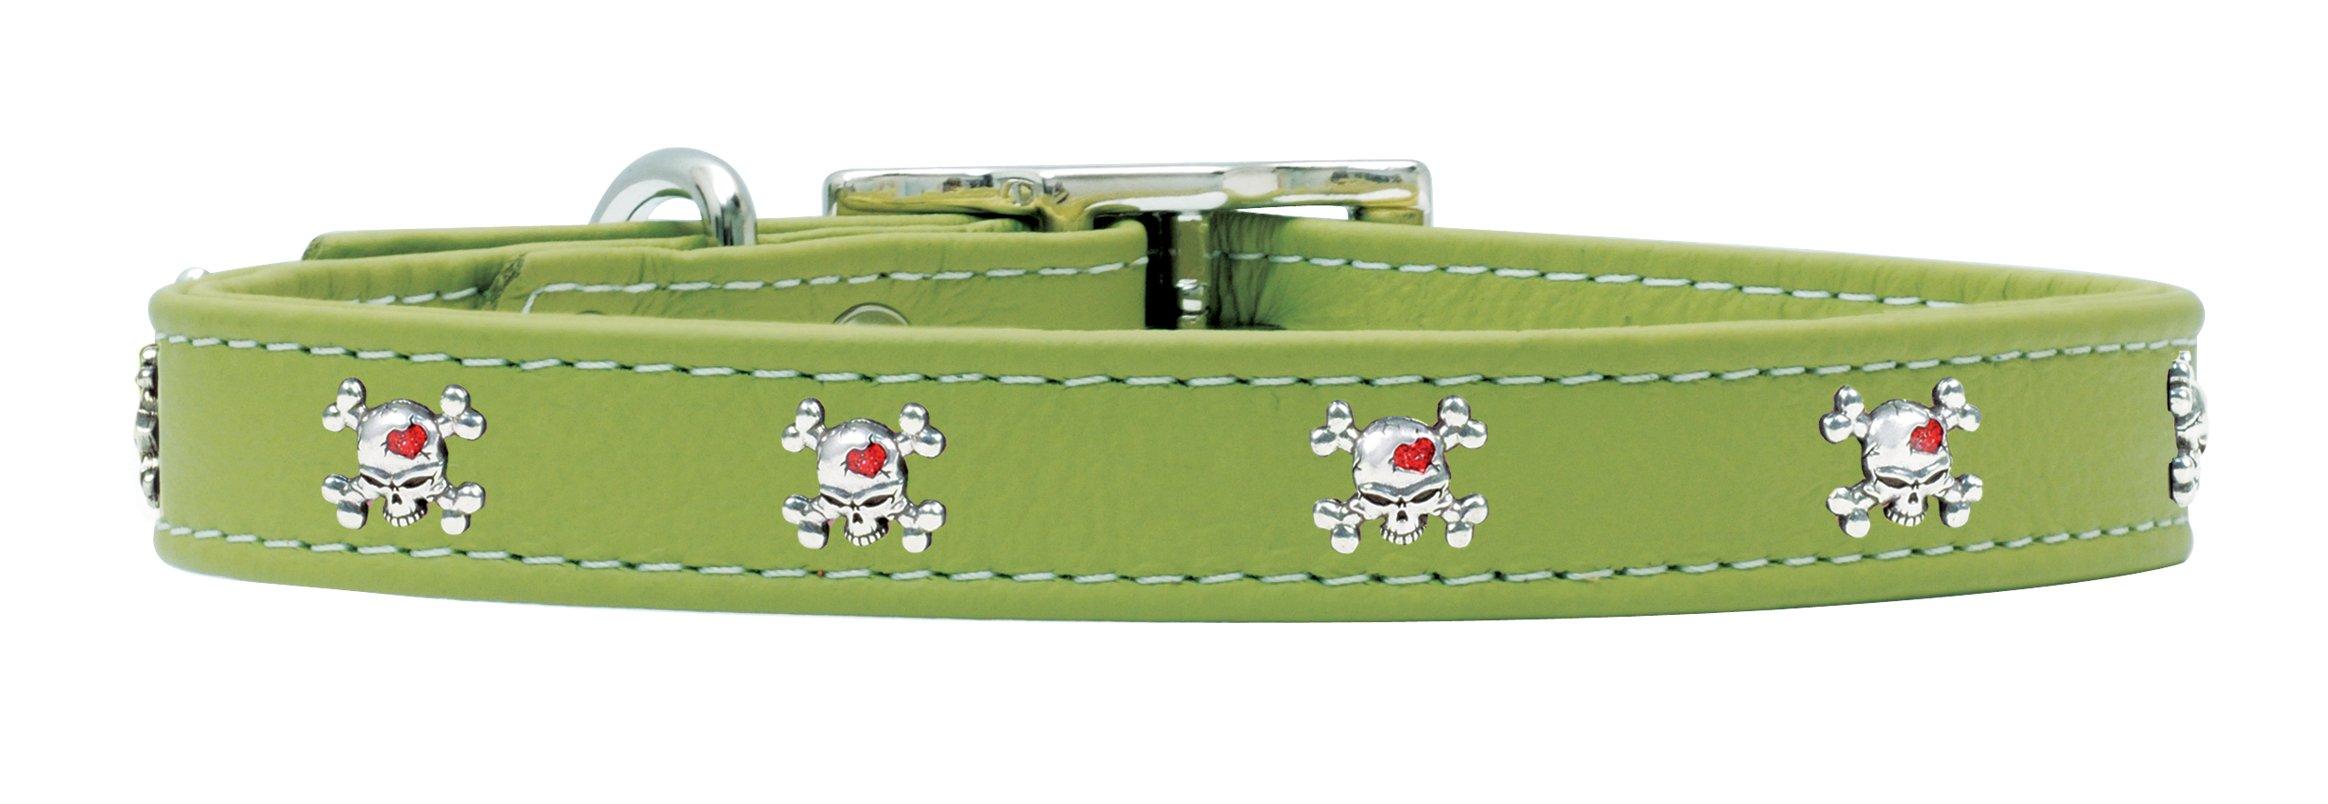 Rockin Doggie Skull Rivets Leather Dog Collar, 1 by 18-Inch, Green by Rockin Doggie